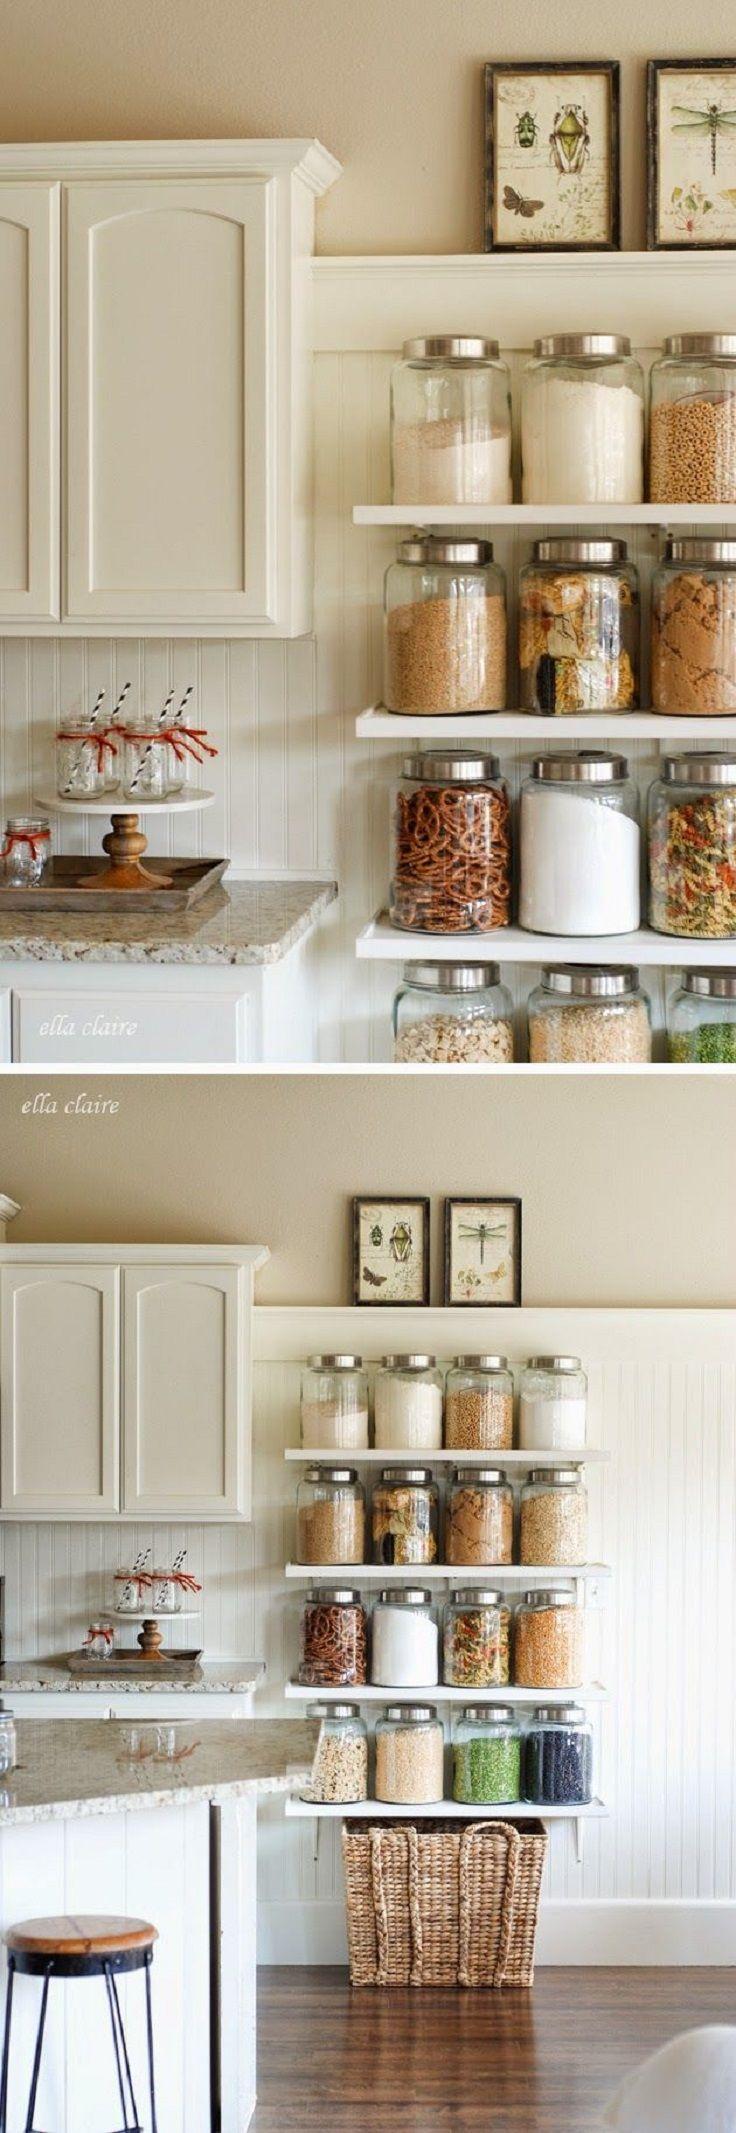 DIY Country Store Kitchen Shelves 16 Super Smart DIY